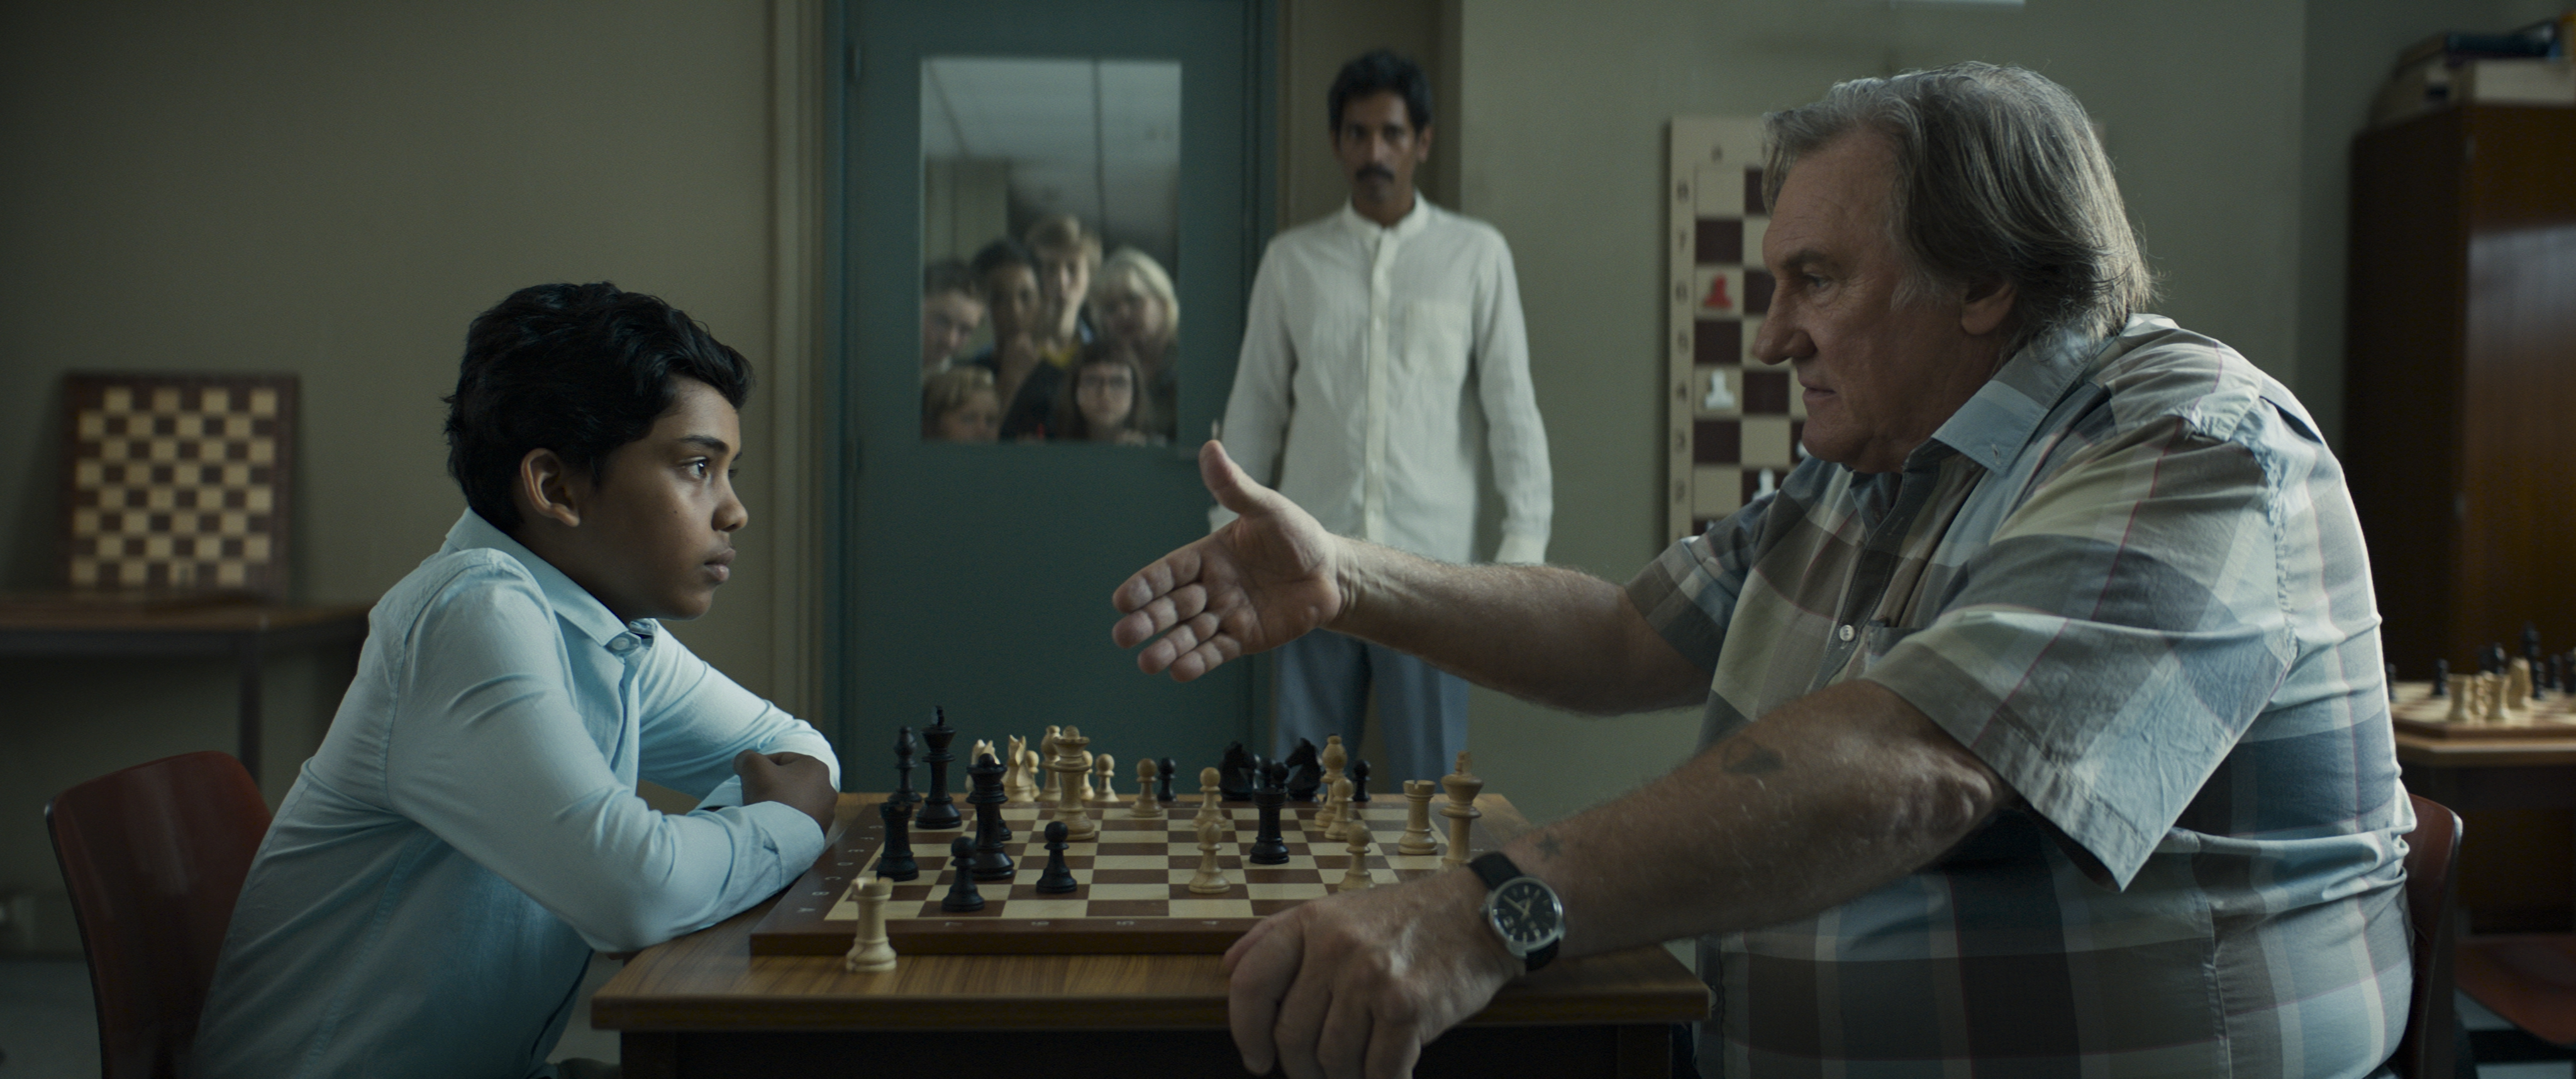 Шахматист Дублированный трейлер